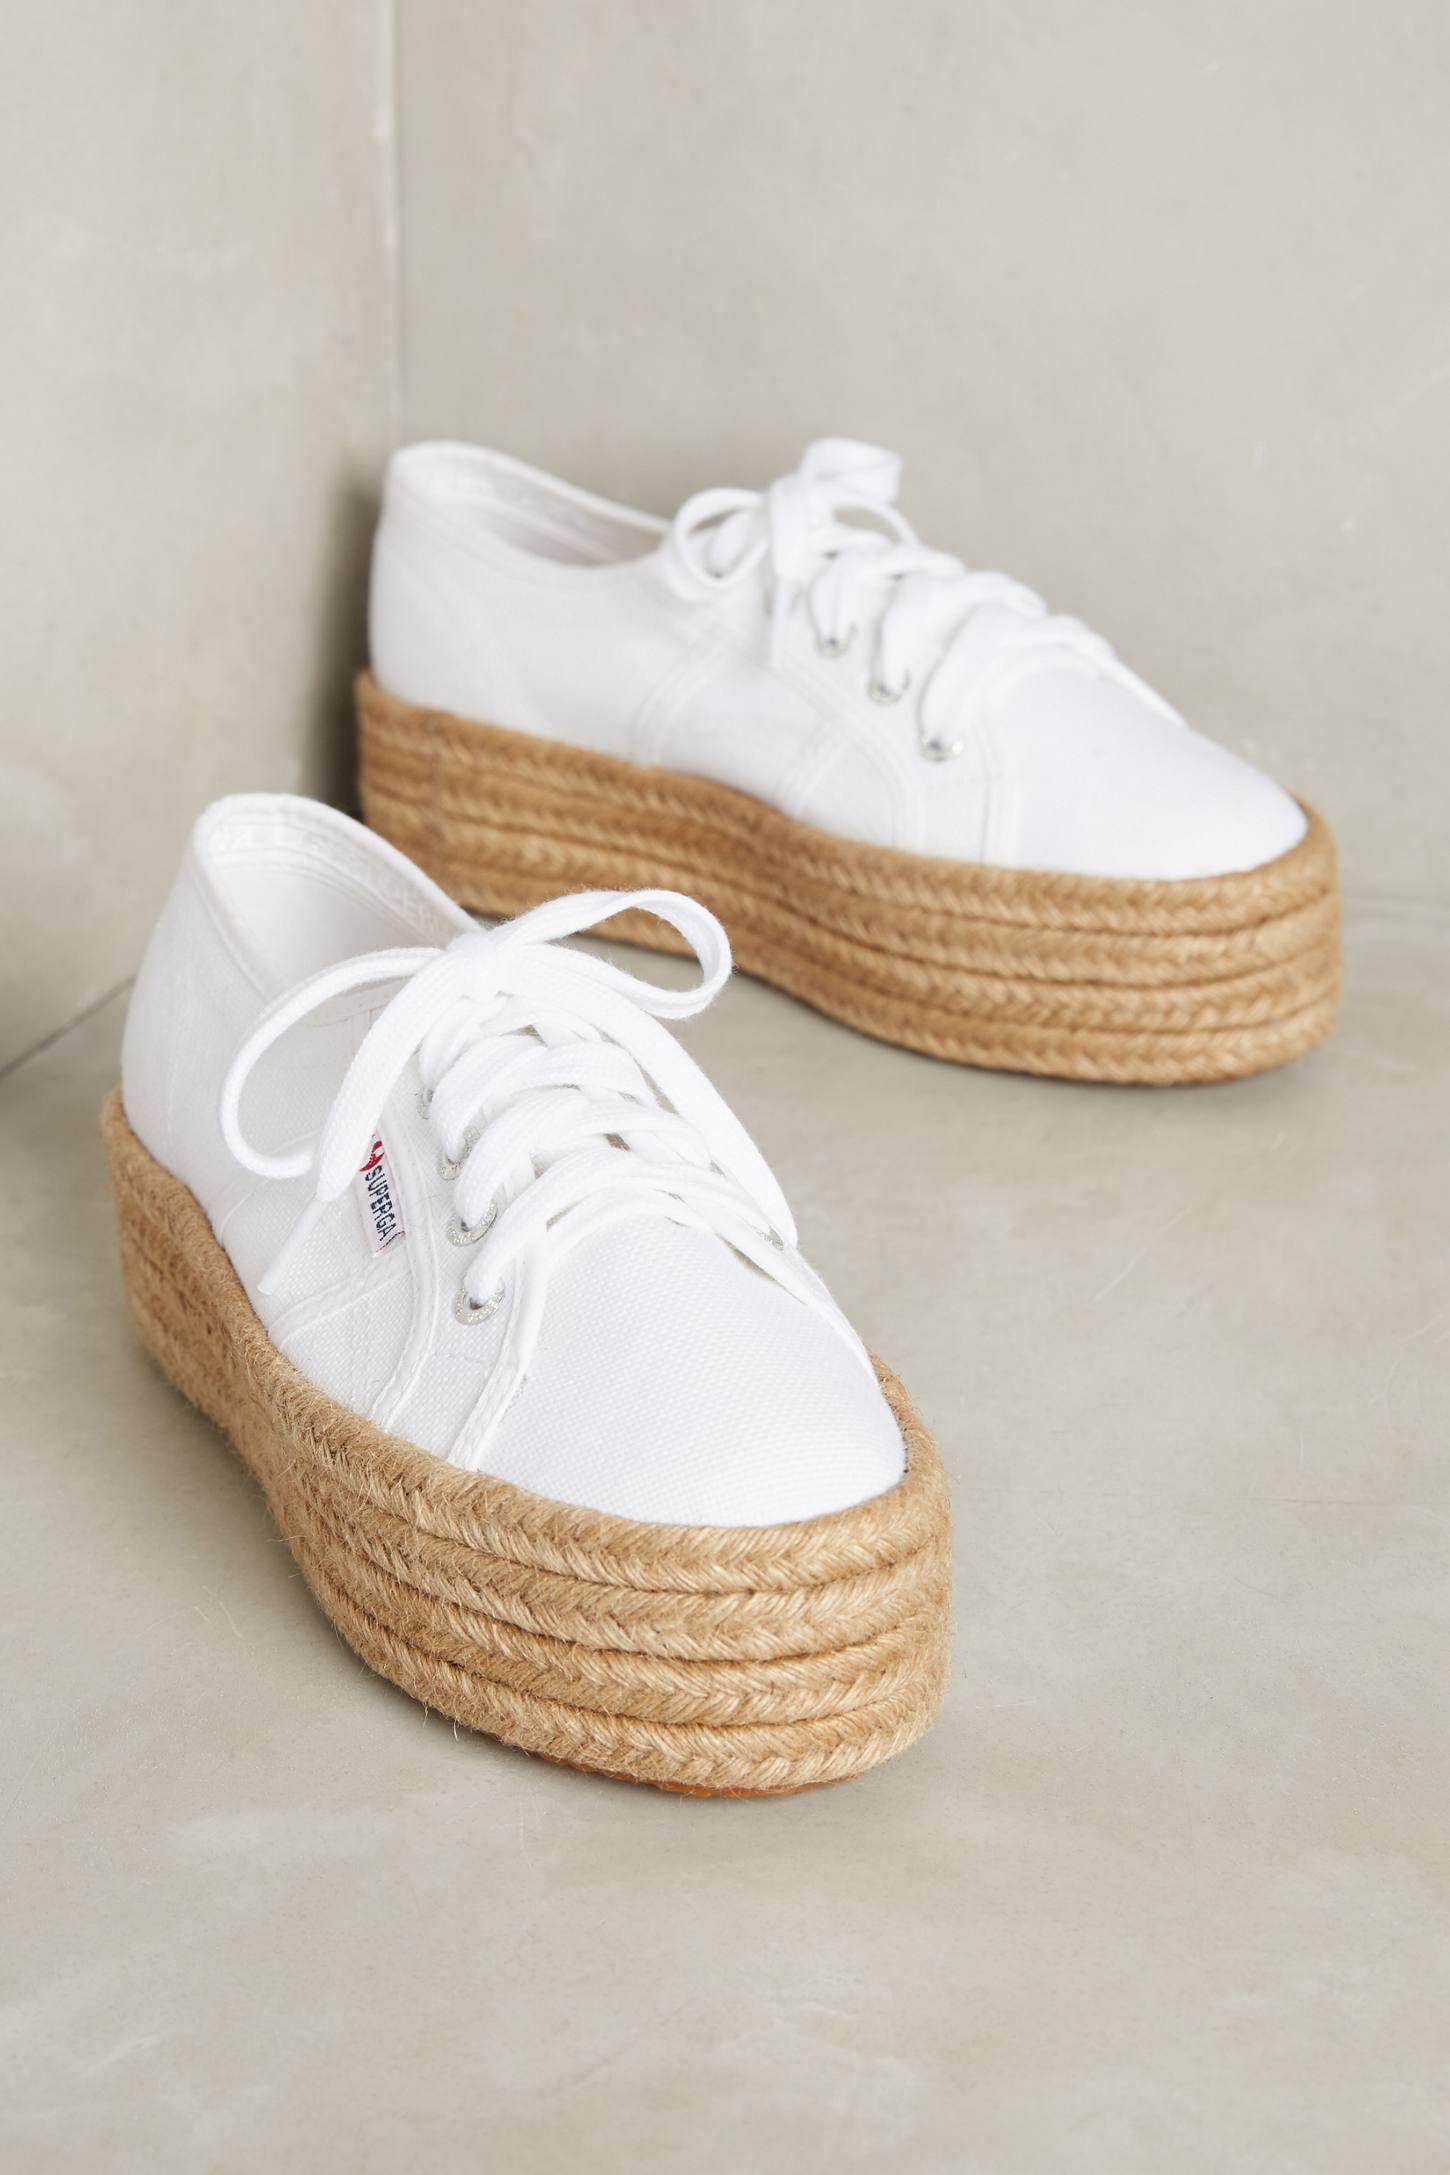 f6cda4c61 Superga Platform Espadrille Sneakers   Shoes   Espadrille sneakers ...